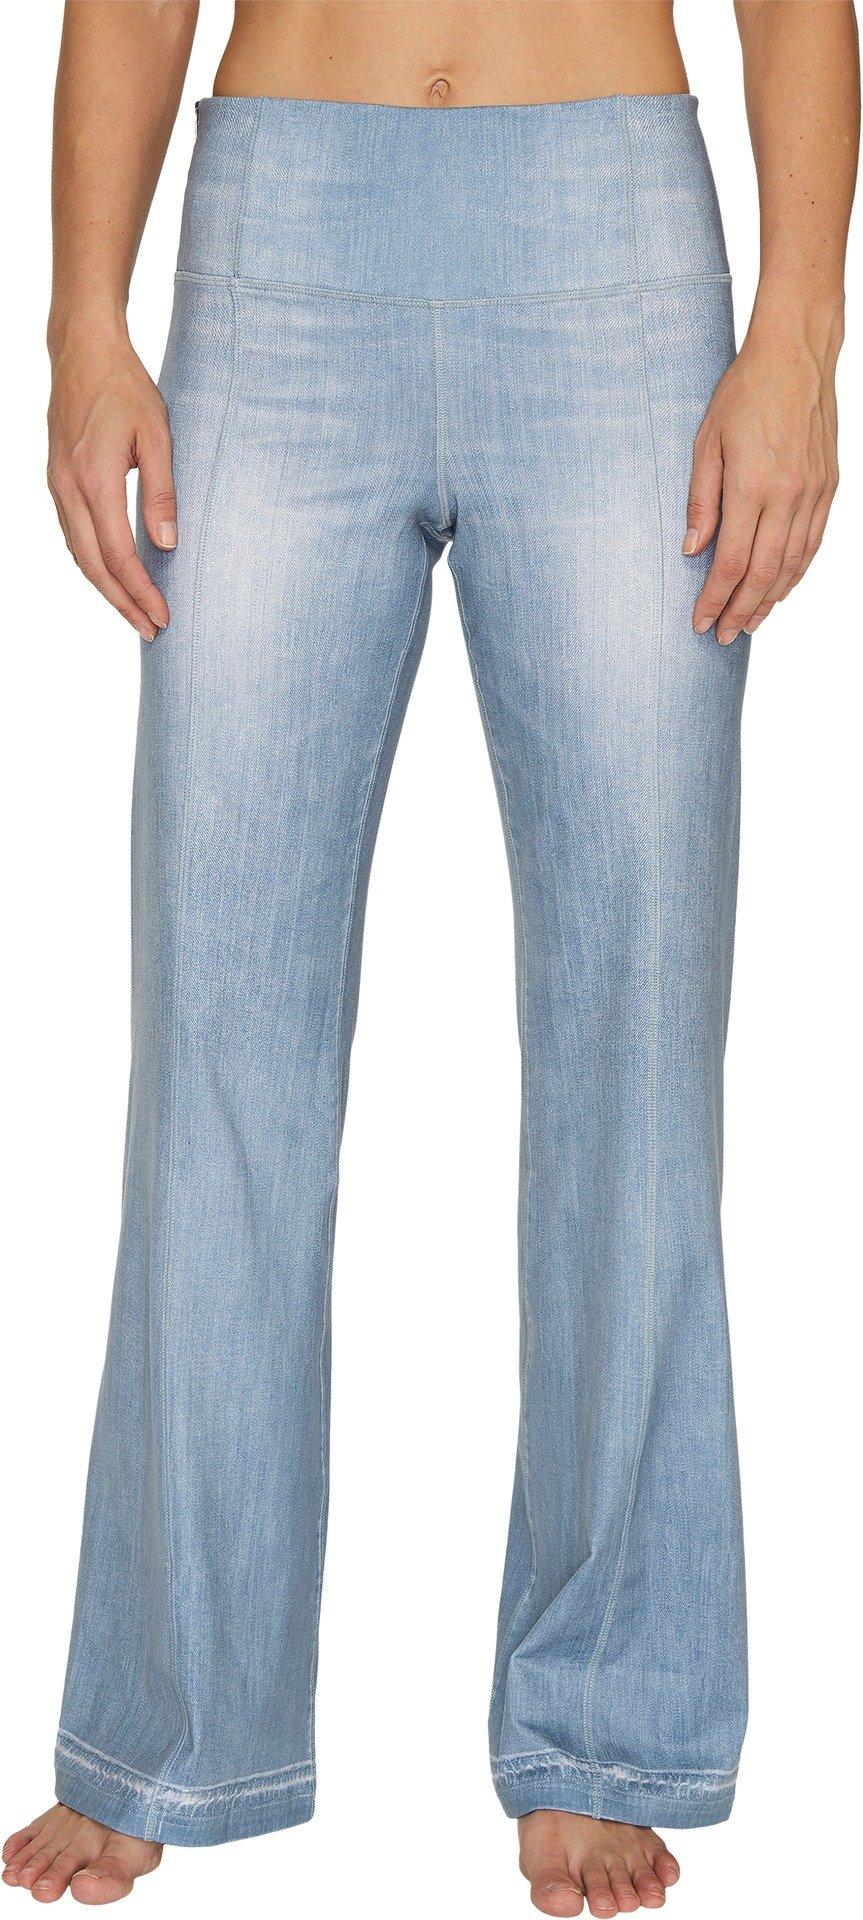 Lucy Women's Indigo Flare Pants Light Indigo Pants